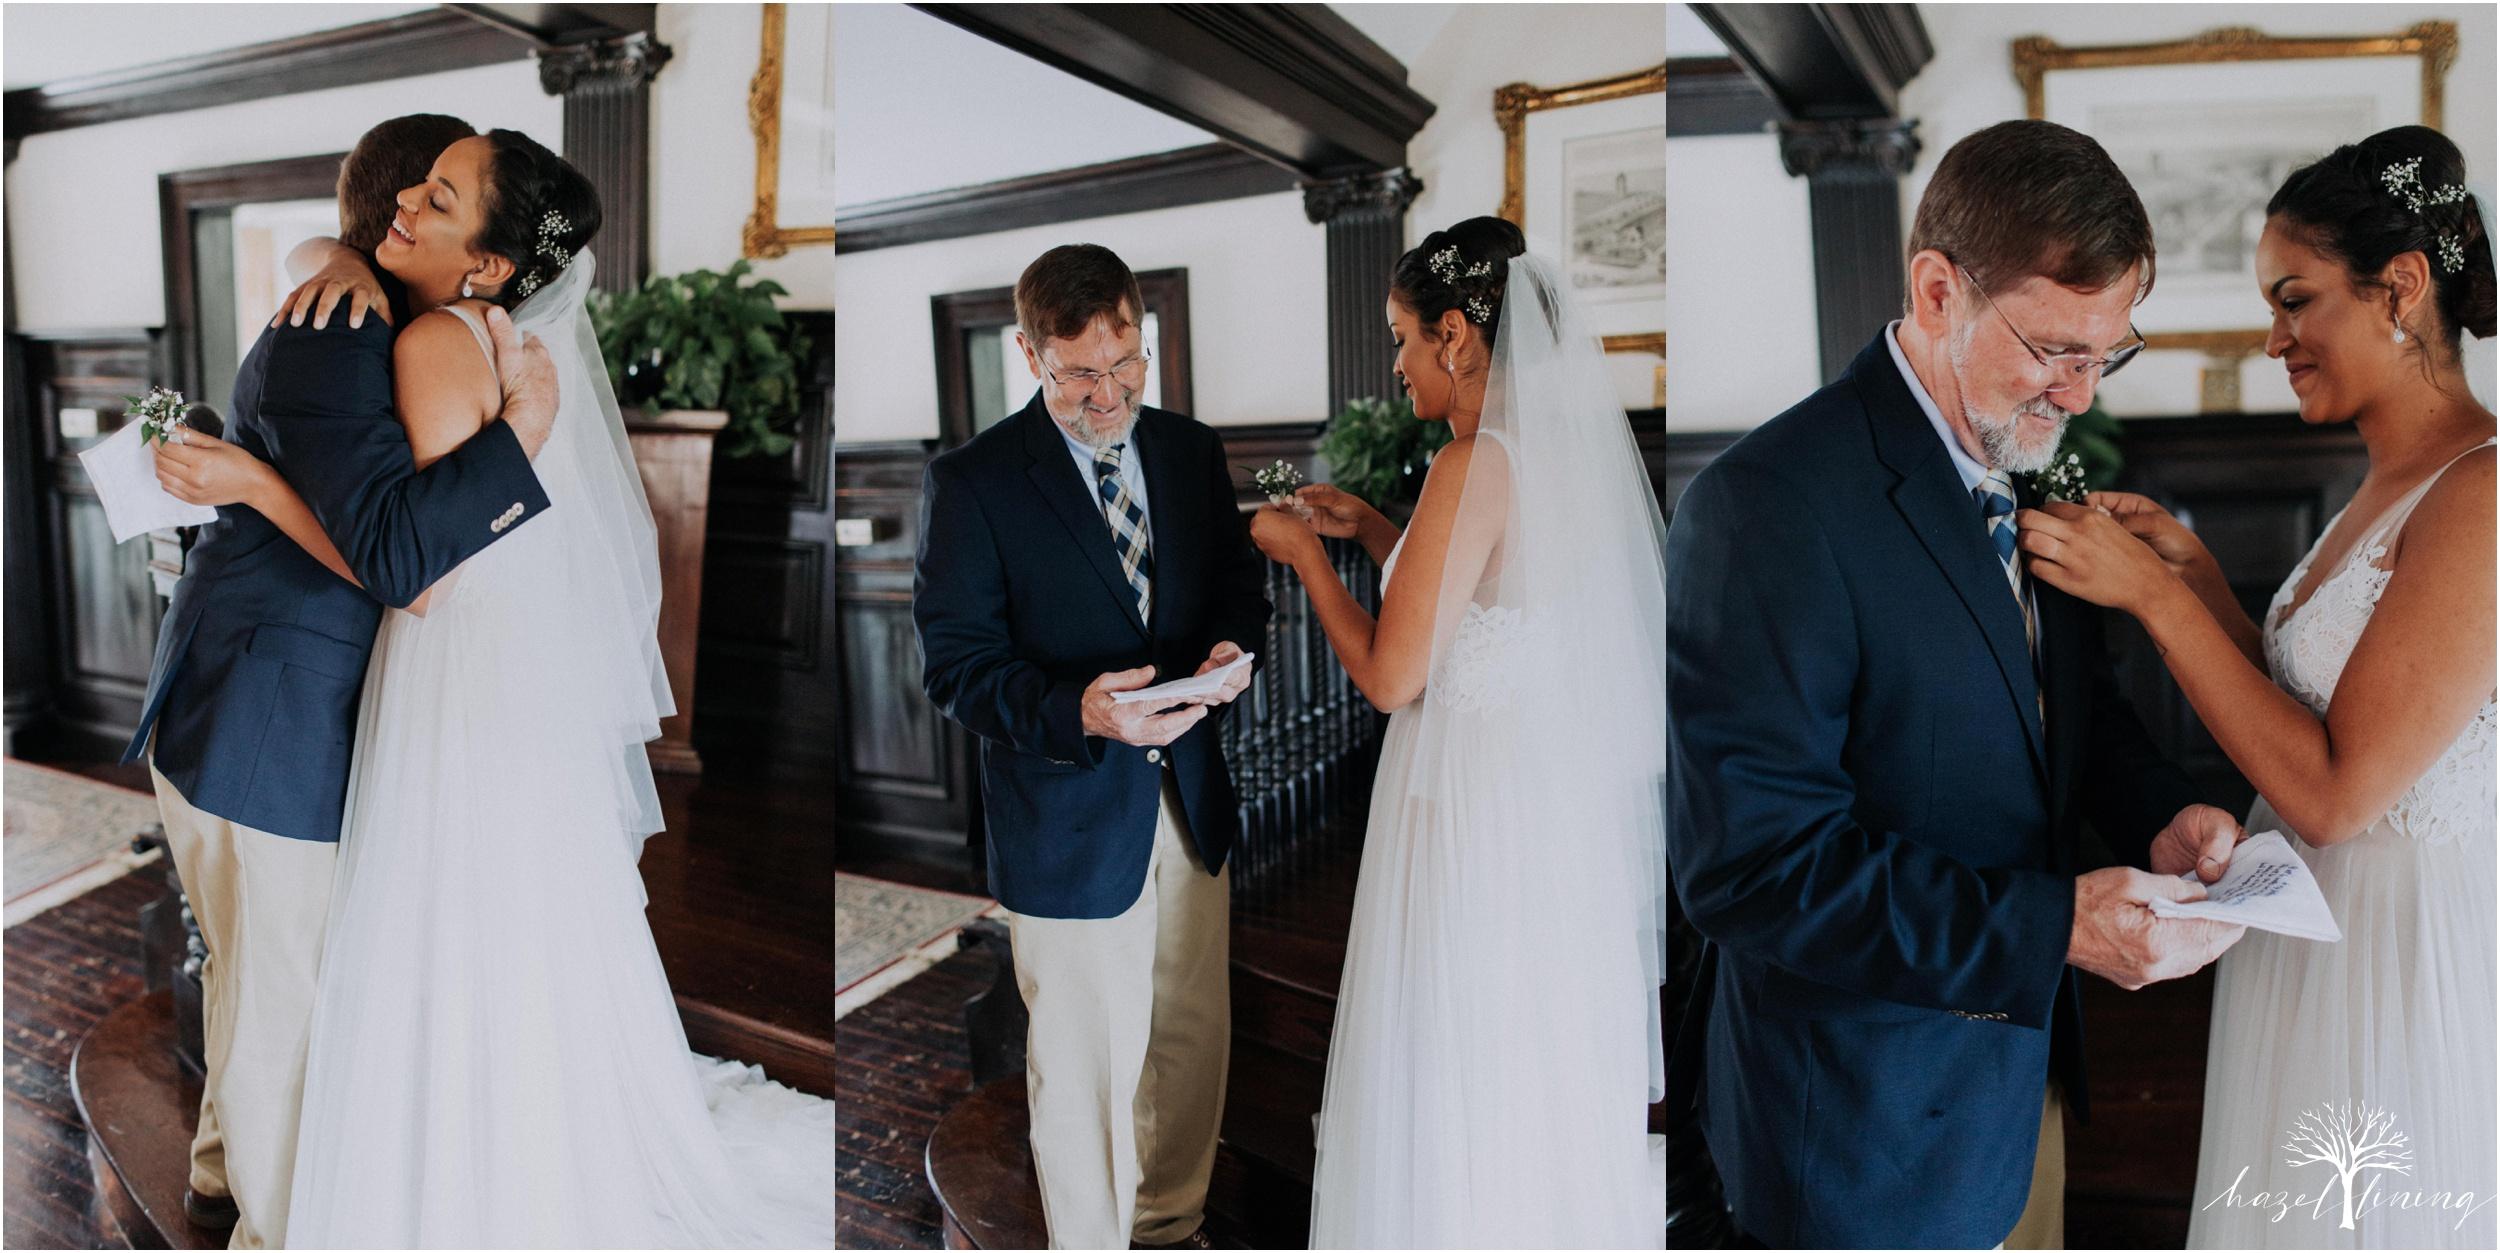 mariah-kreyling-samuel-sherratt-sherrattwiththeworld-peirce-farm-at-witch-hill-boston-massachusetts-wedding-photography-hazel-lining-travel-wedding-elopement-photography_0017.jpg